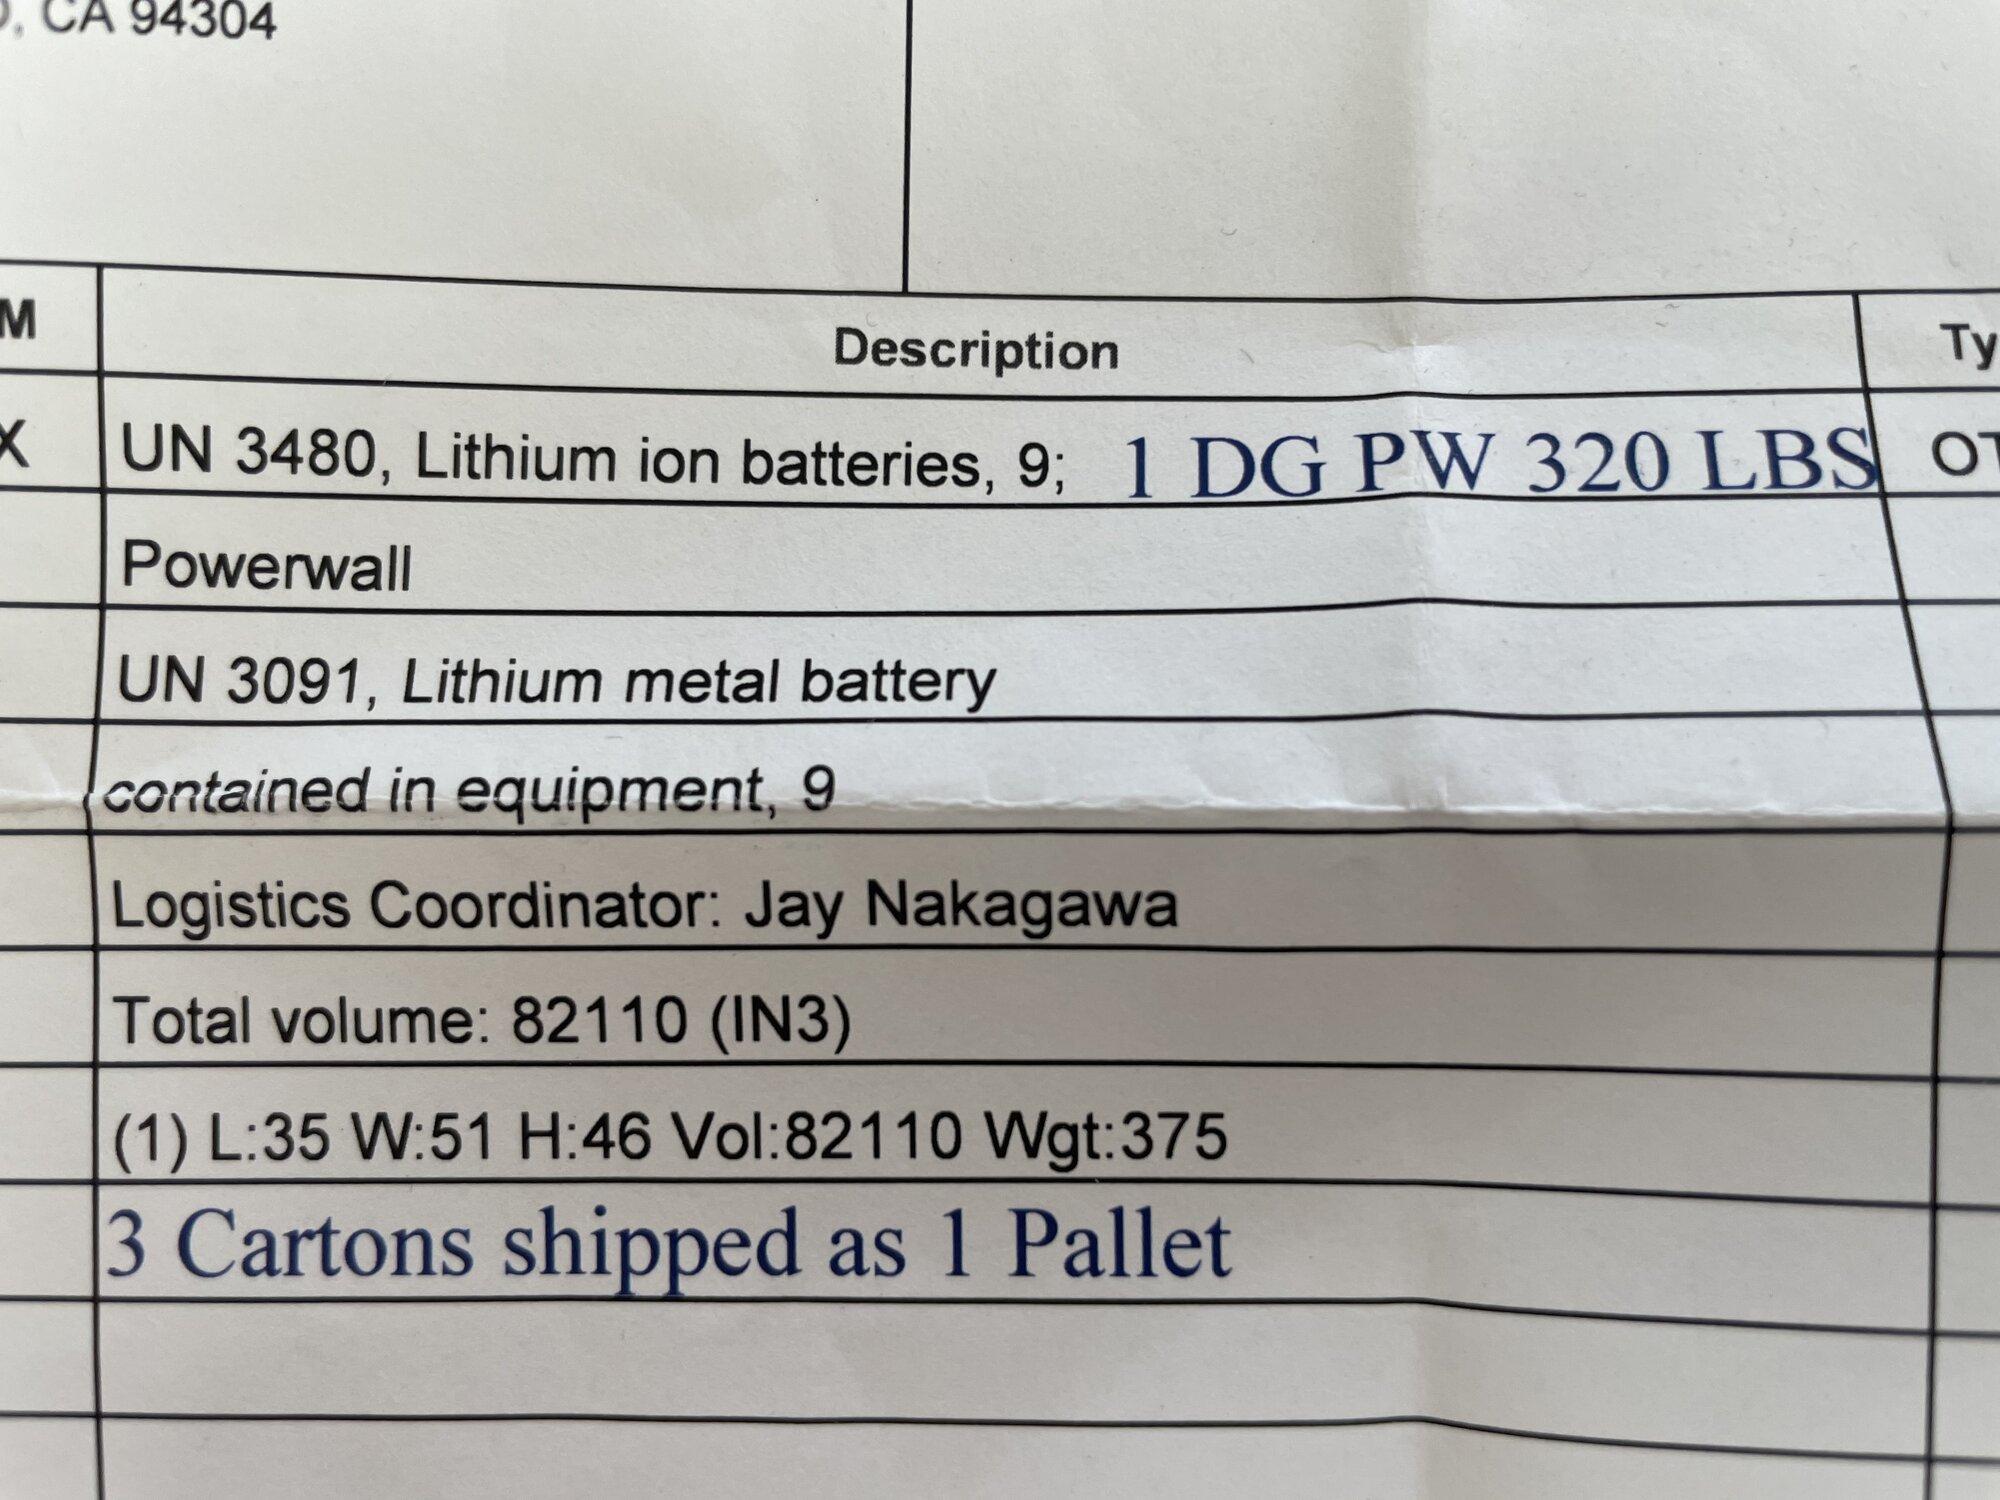 DDD90853-A233-44C7-A61B-1B9FA197709C.jpeg